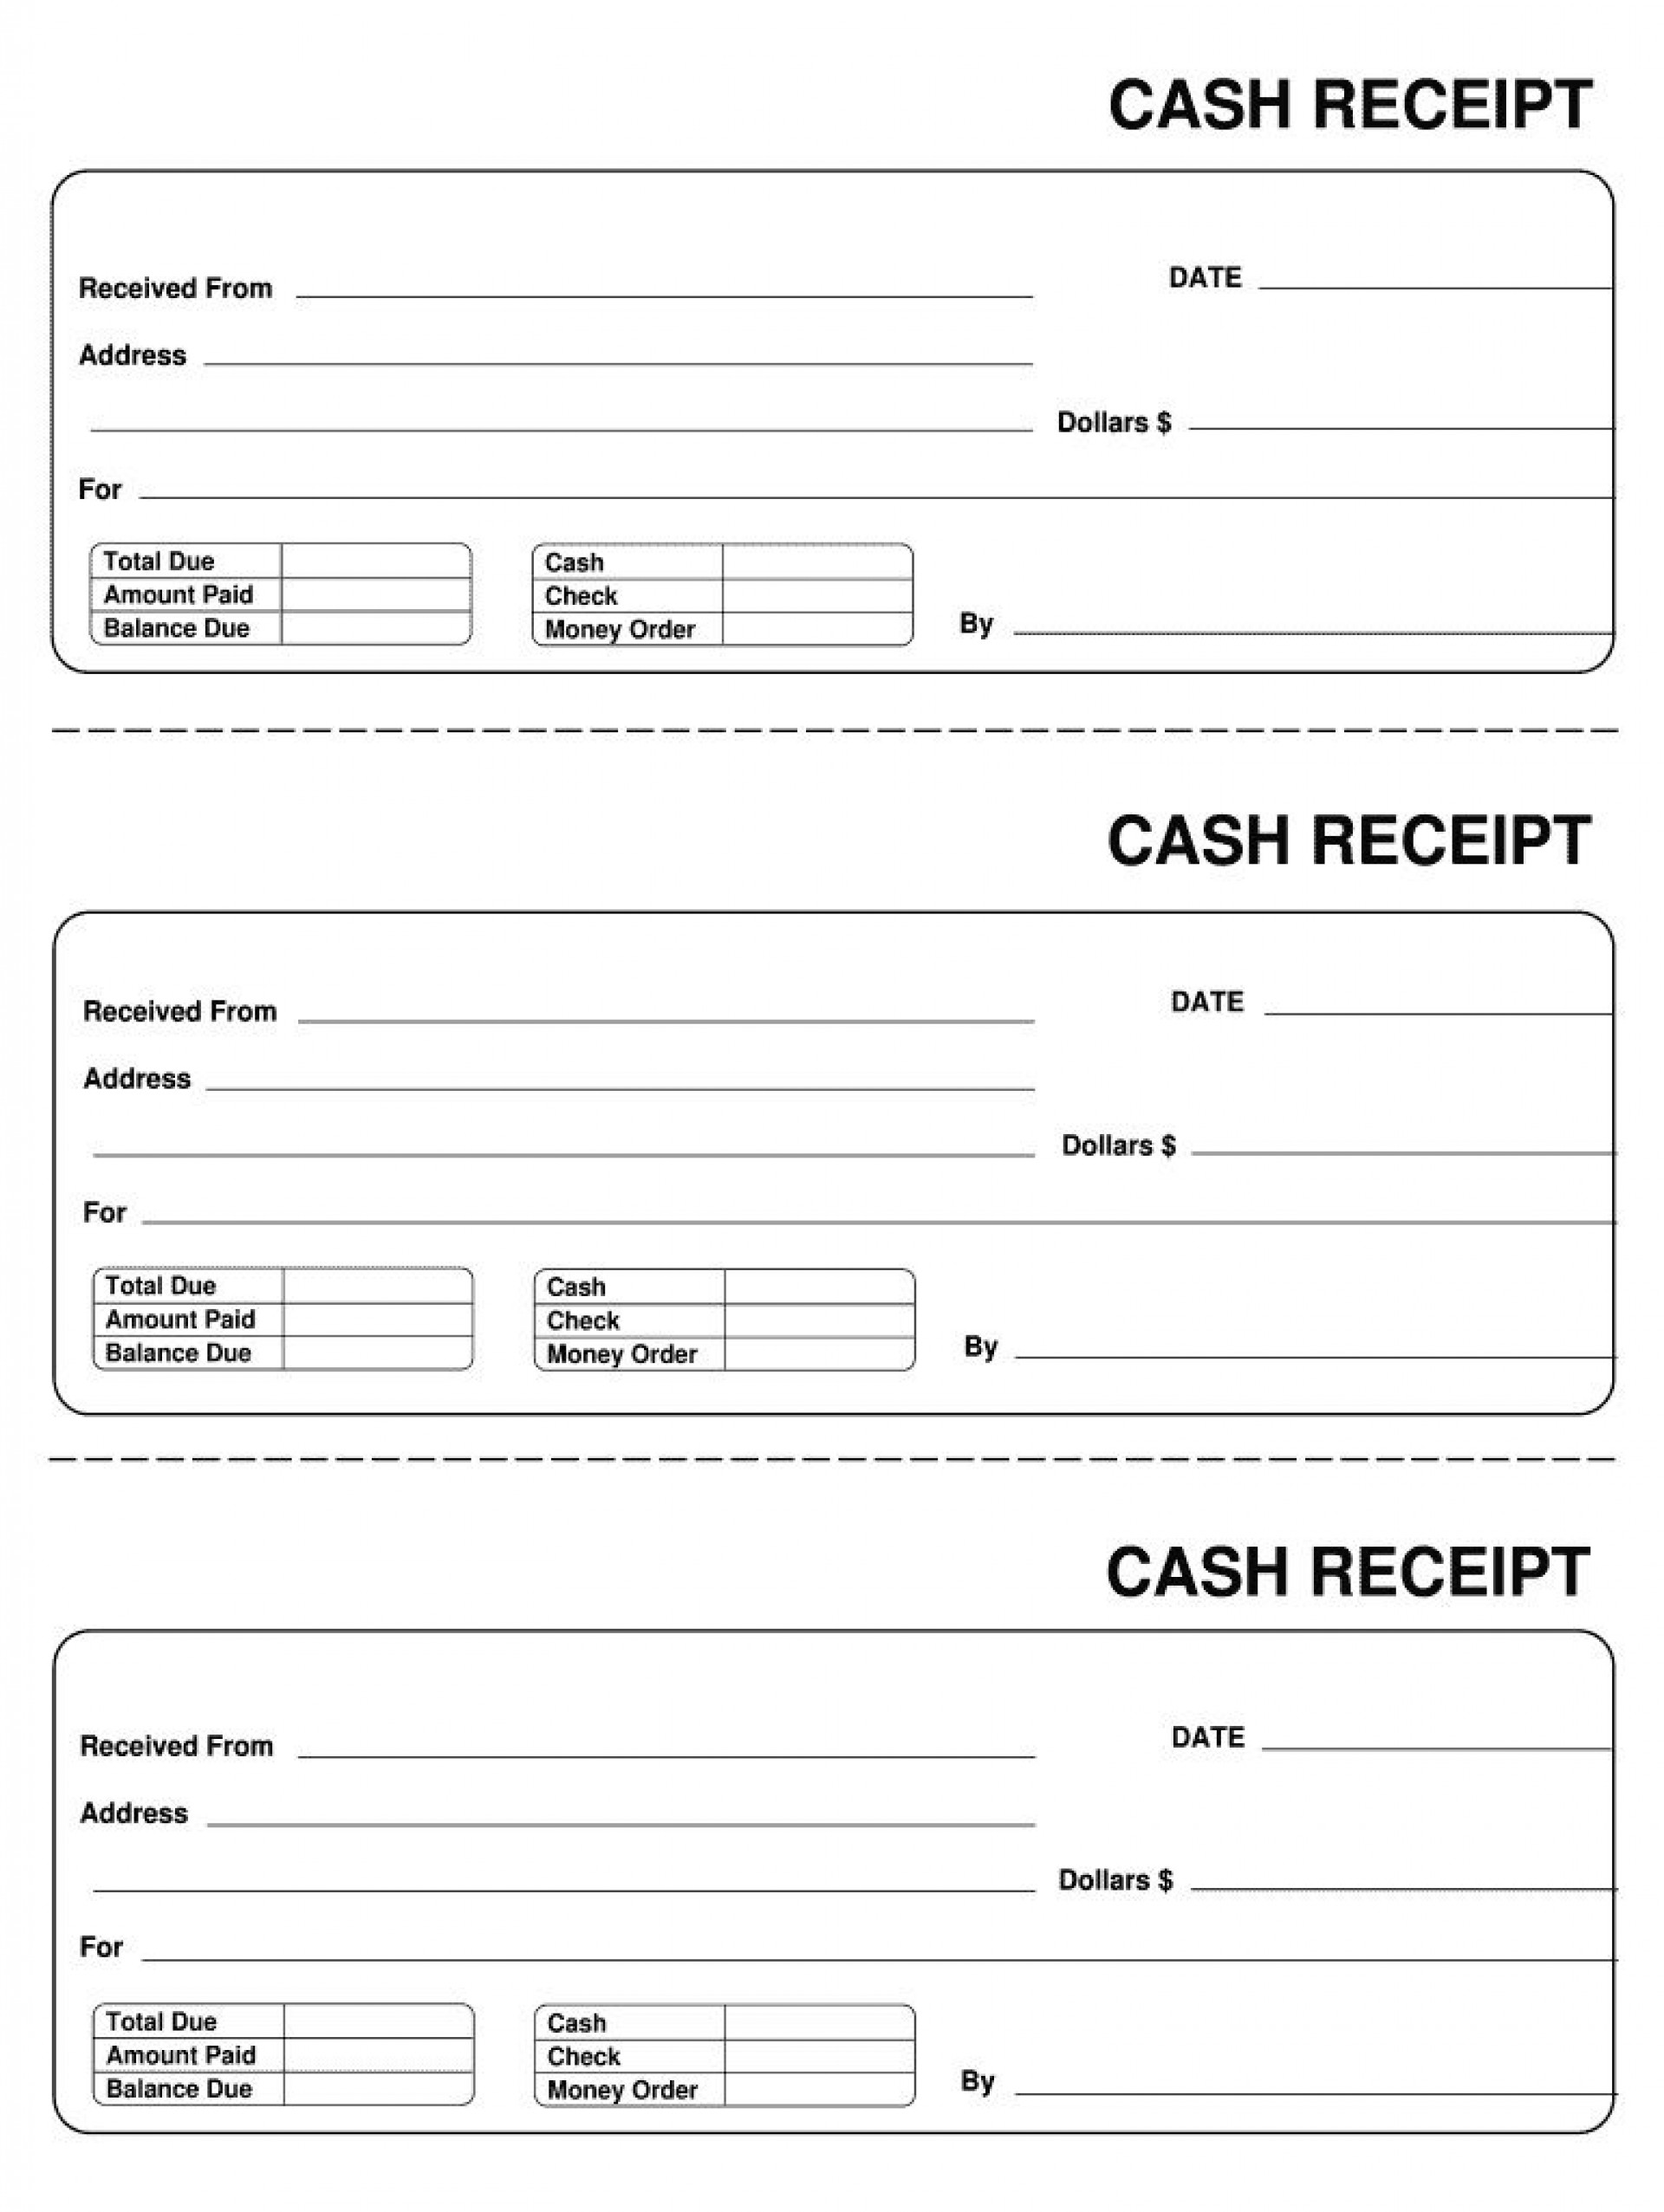 007 Astounding Invoice Template Pdf Fillable Photo  Free Cash Receipt Commercial1920